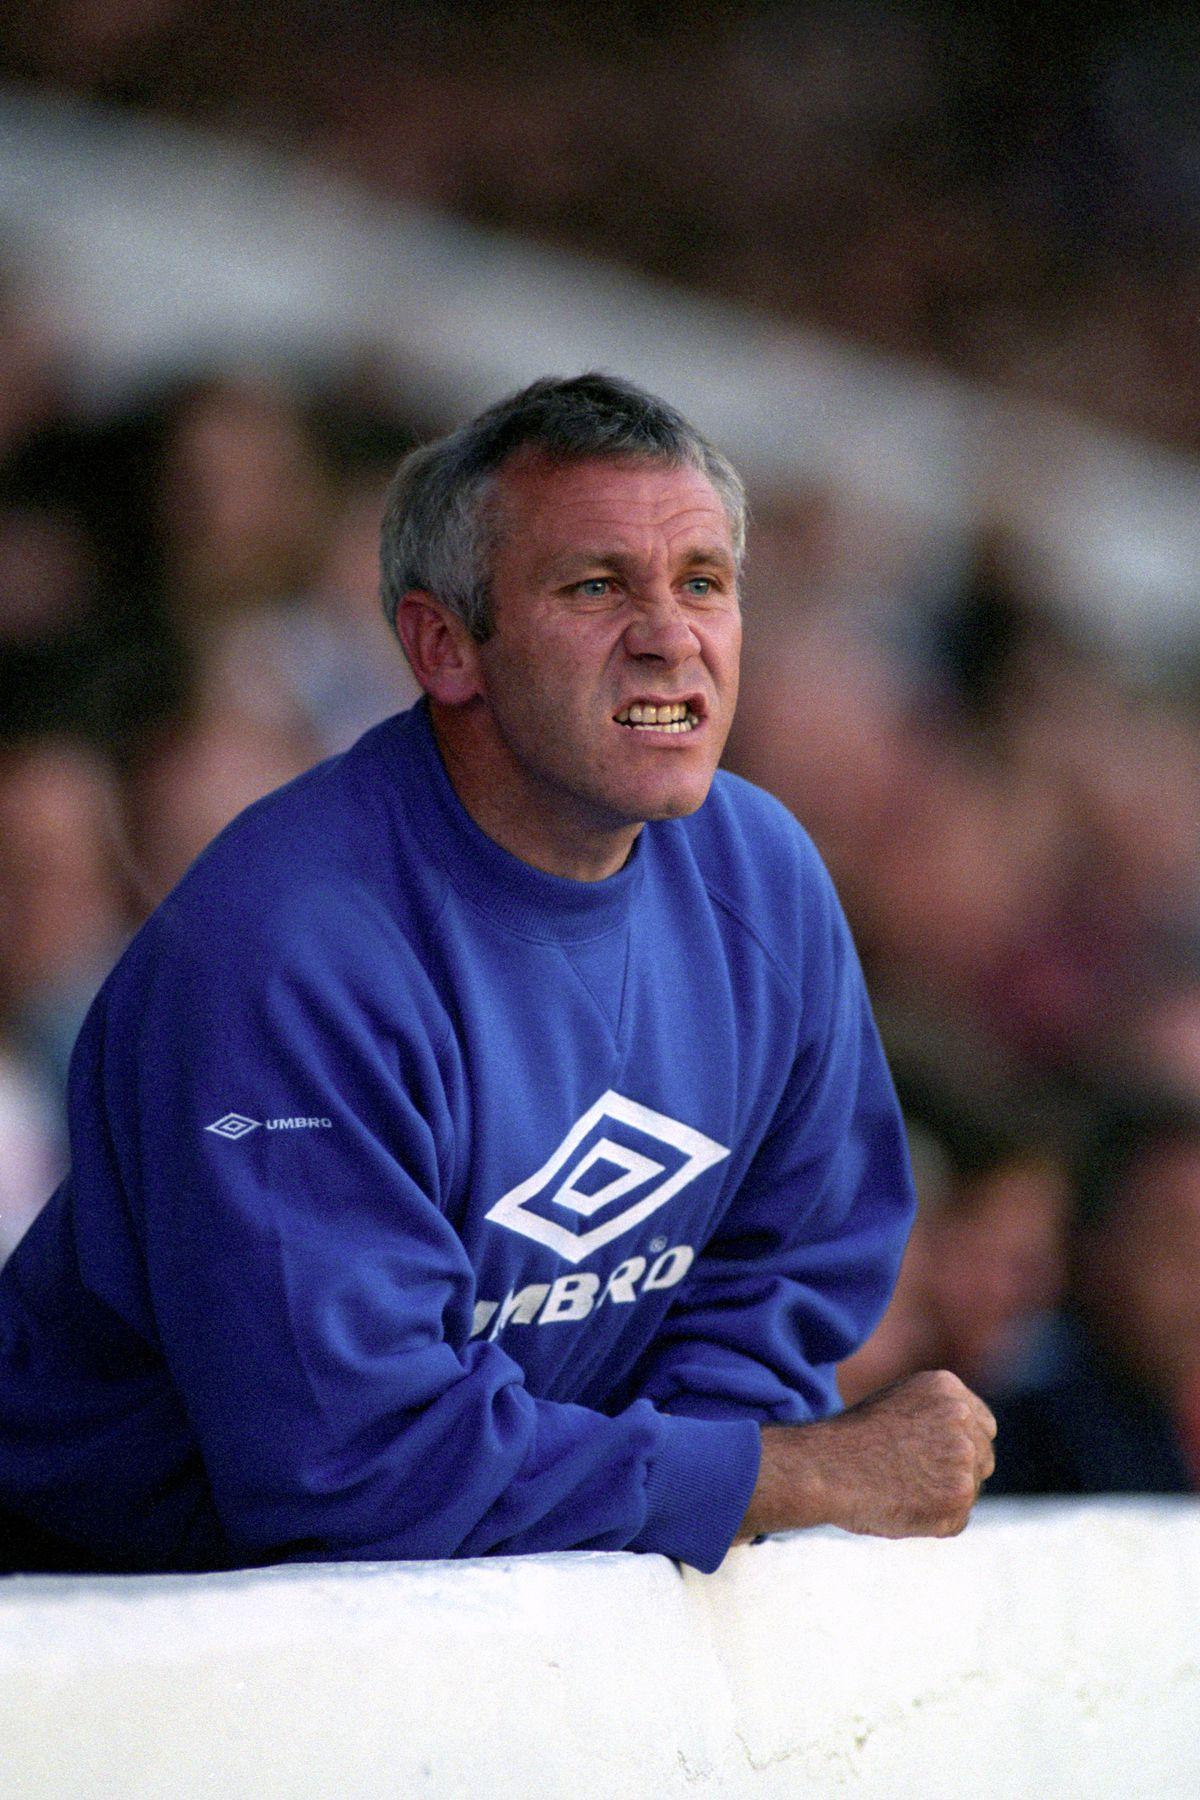 Soccer - Premier League - Blackburn Rovers v Manchester City - Ewood Park